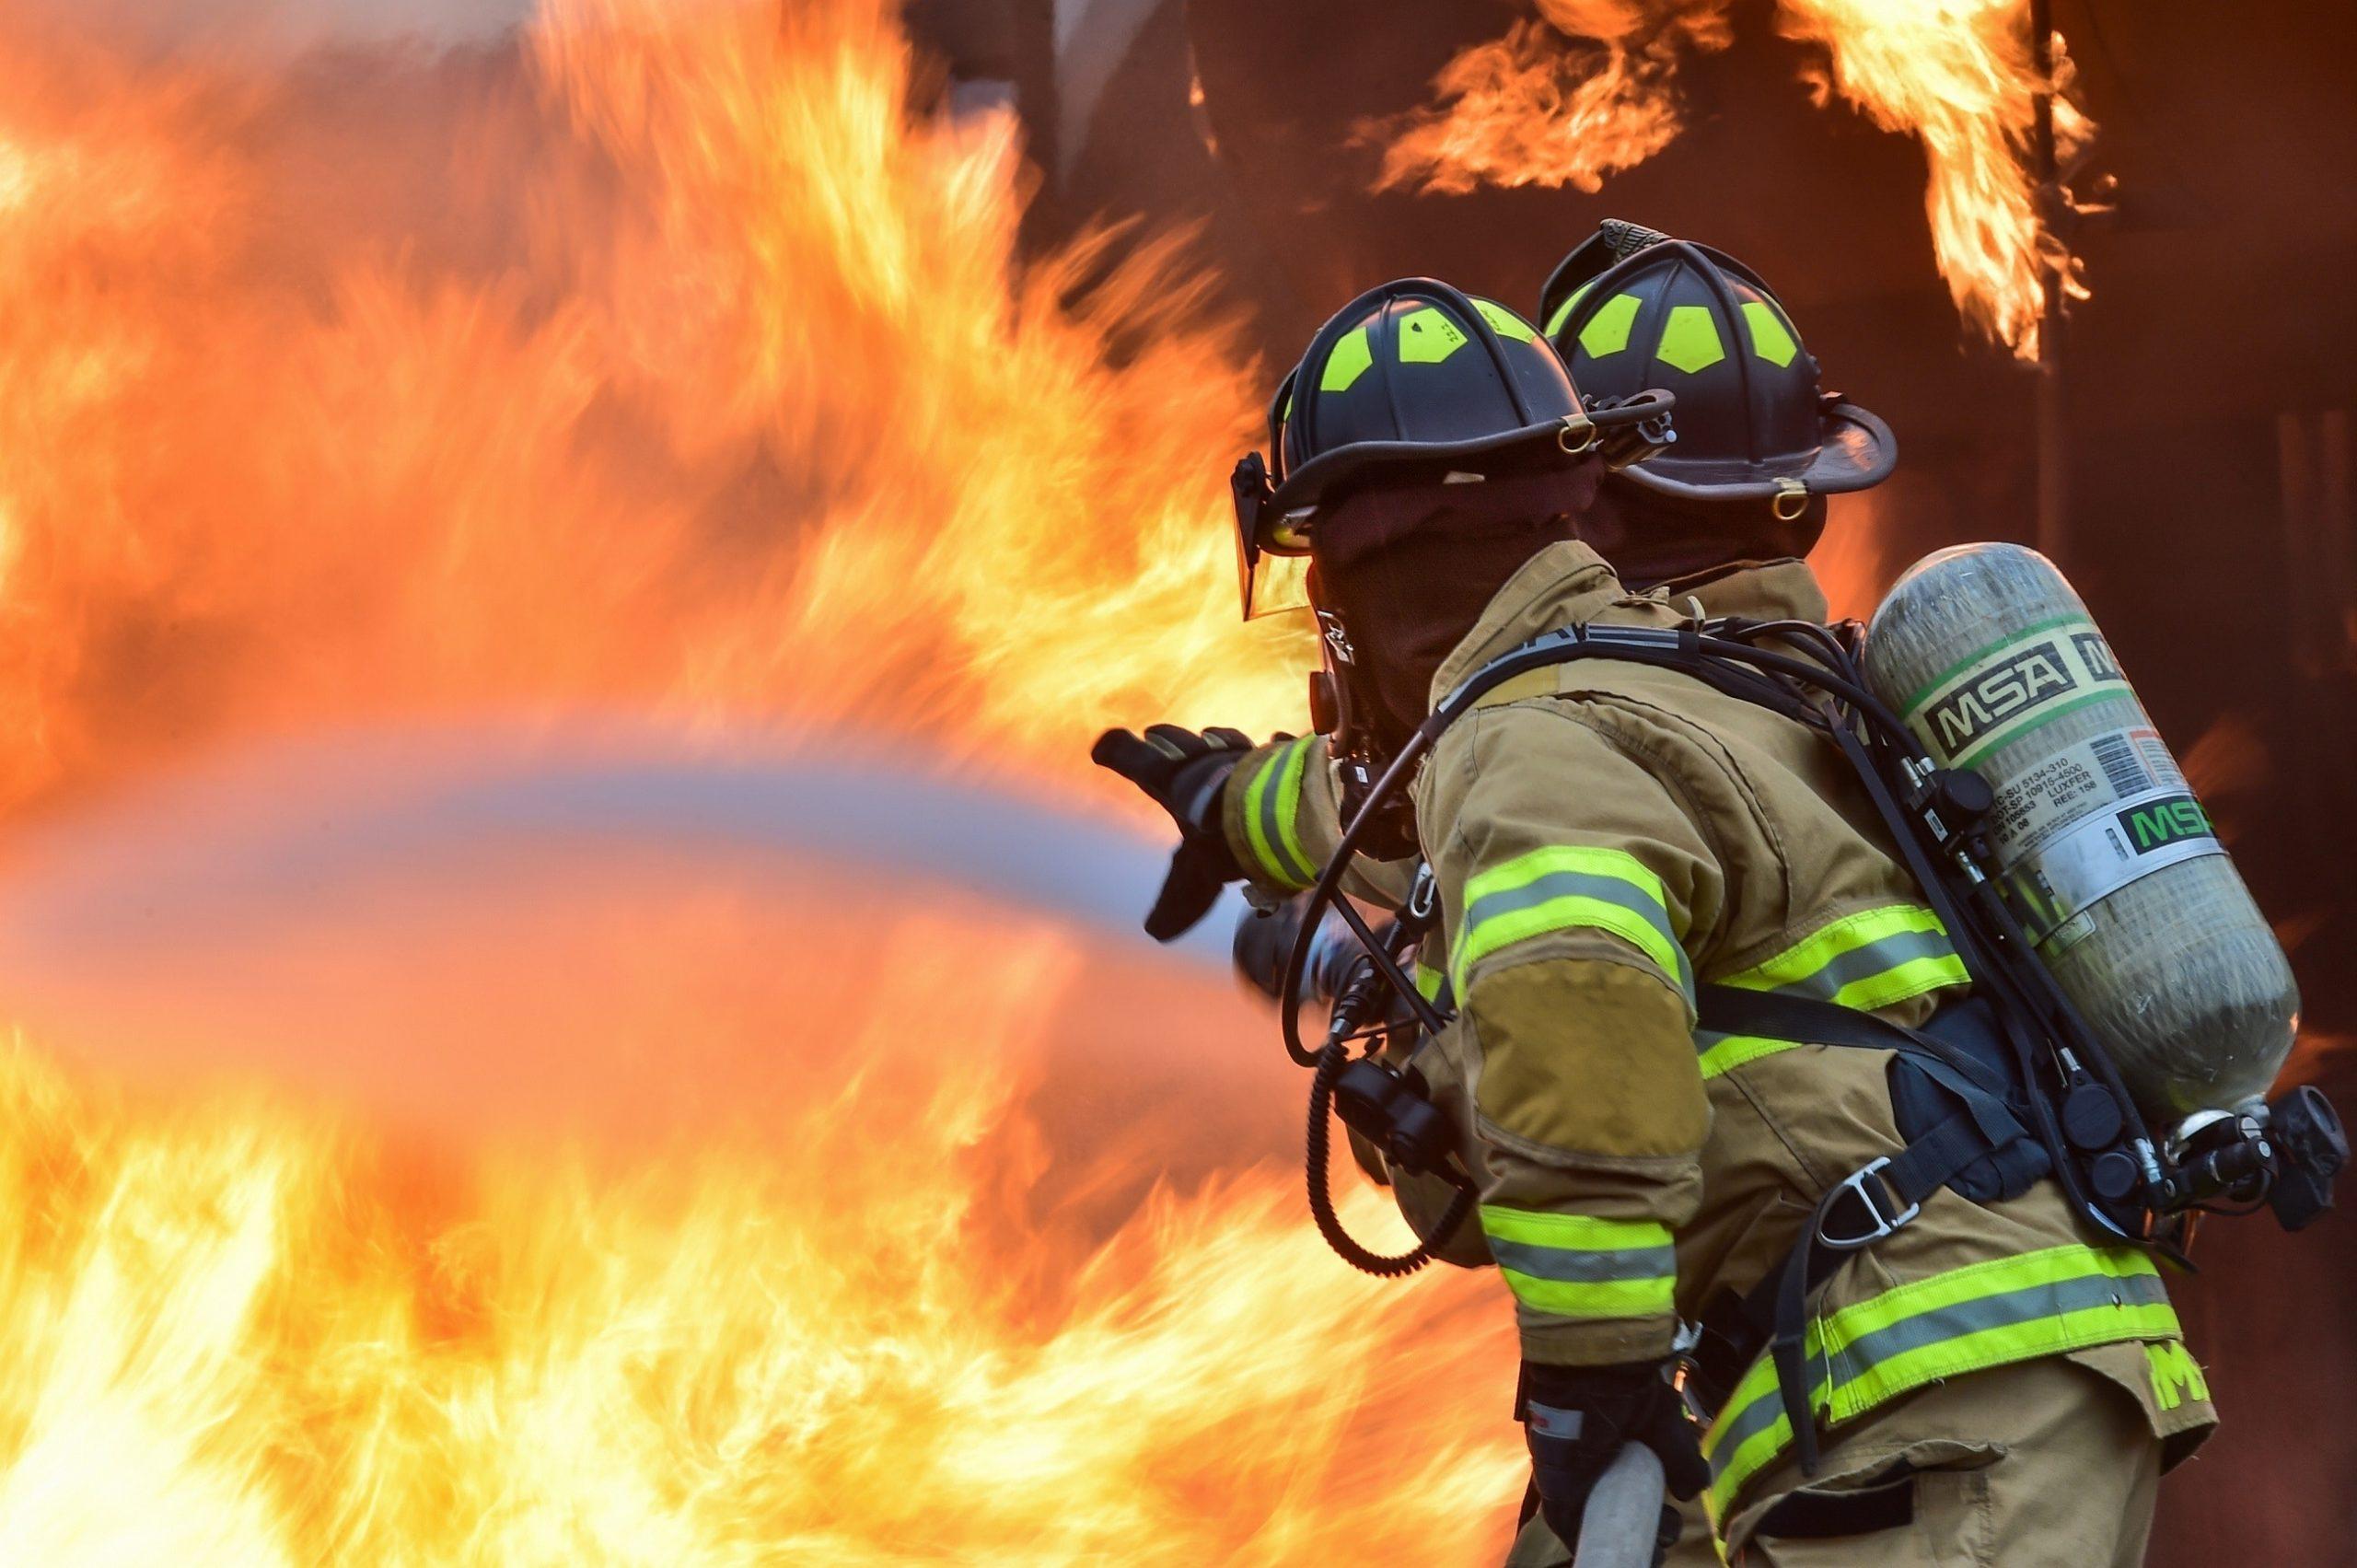 Fire Hazards of Thanksgiving - Shefter, Stuart - Paint Covered Overalls - Durham North Carolina